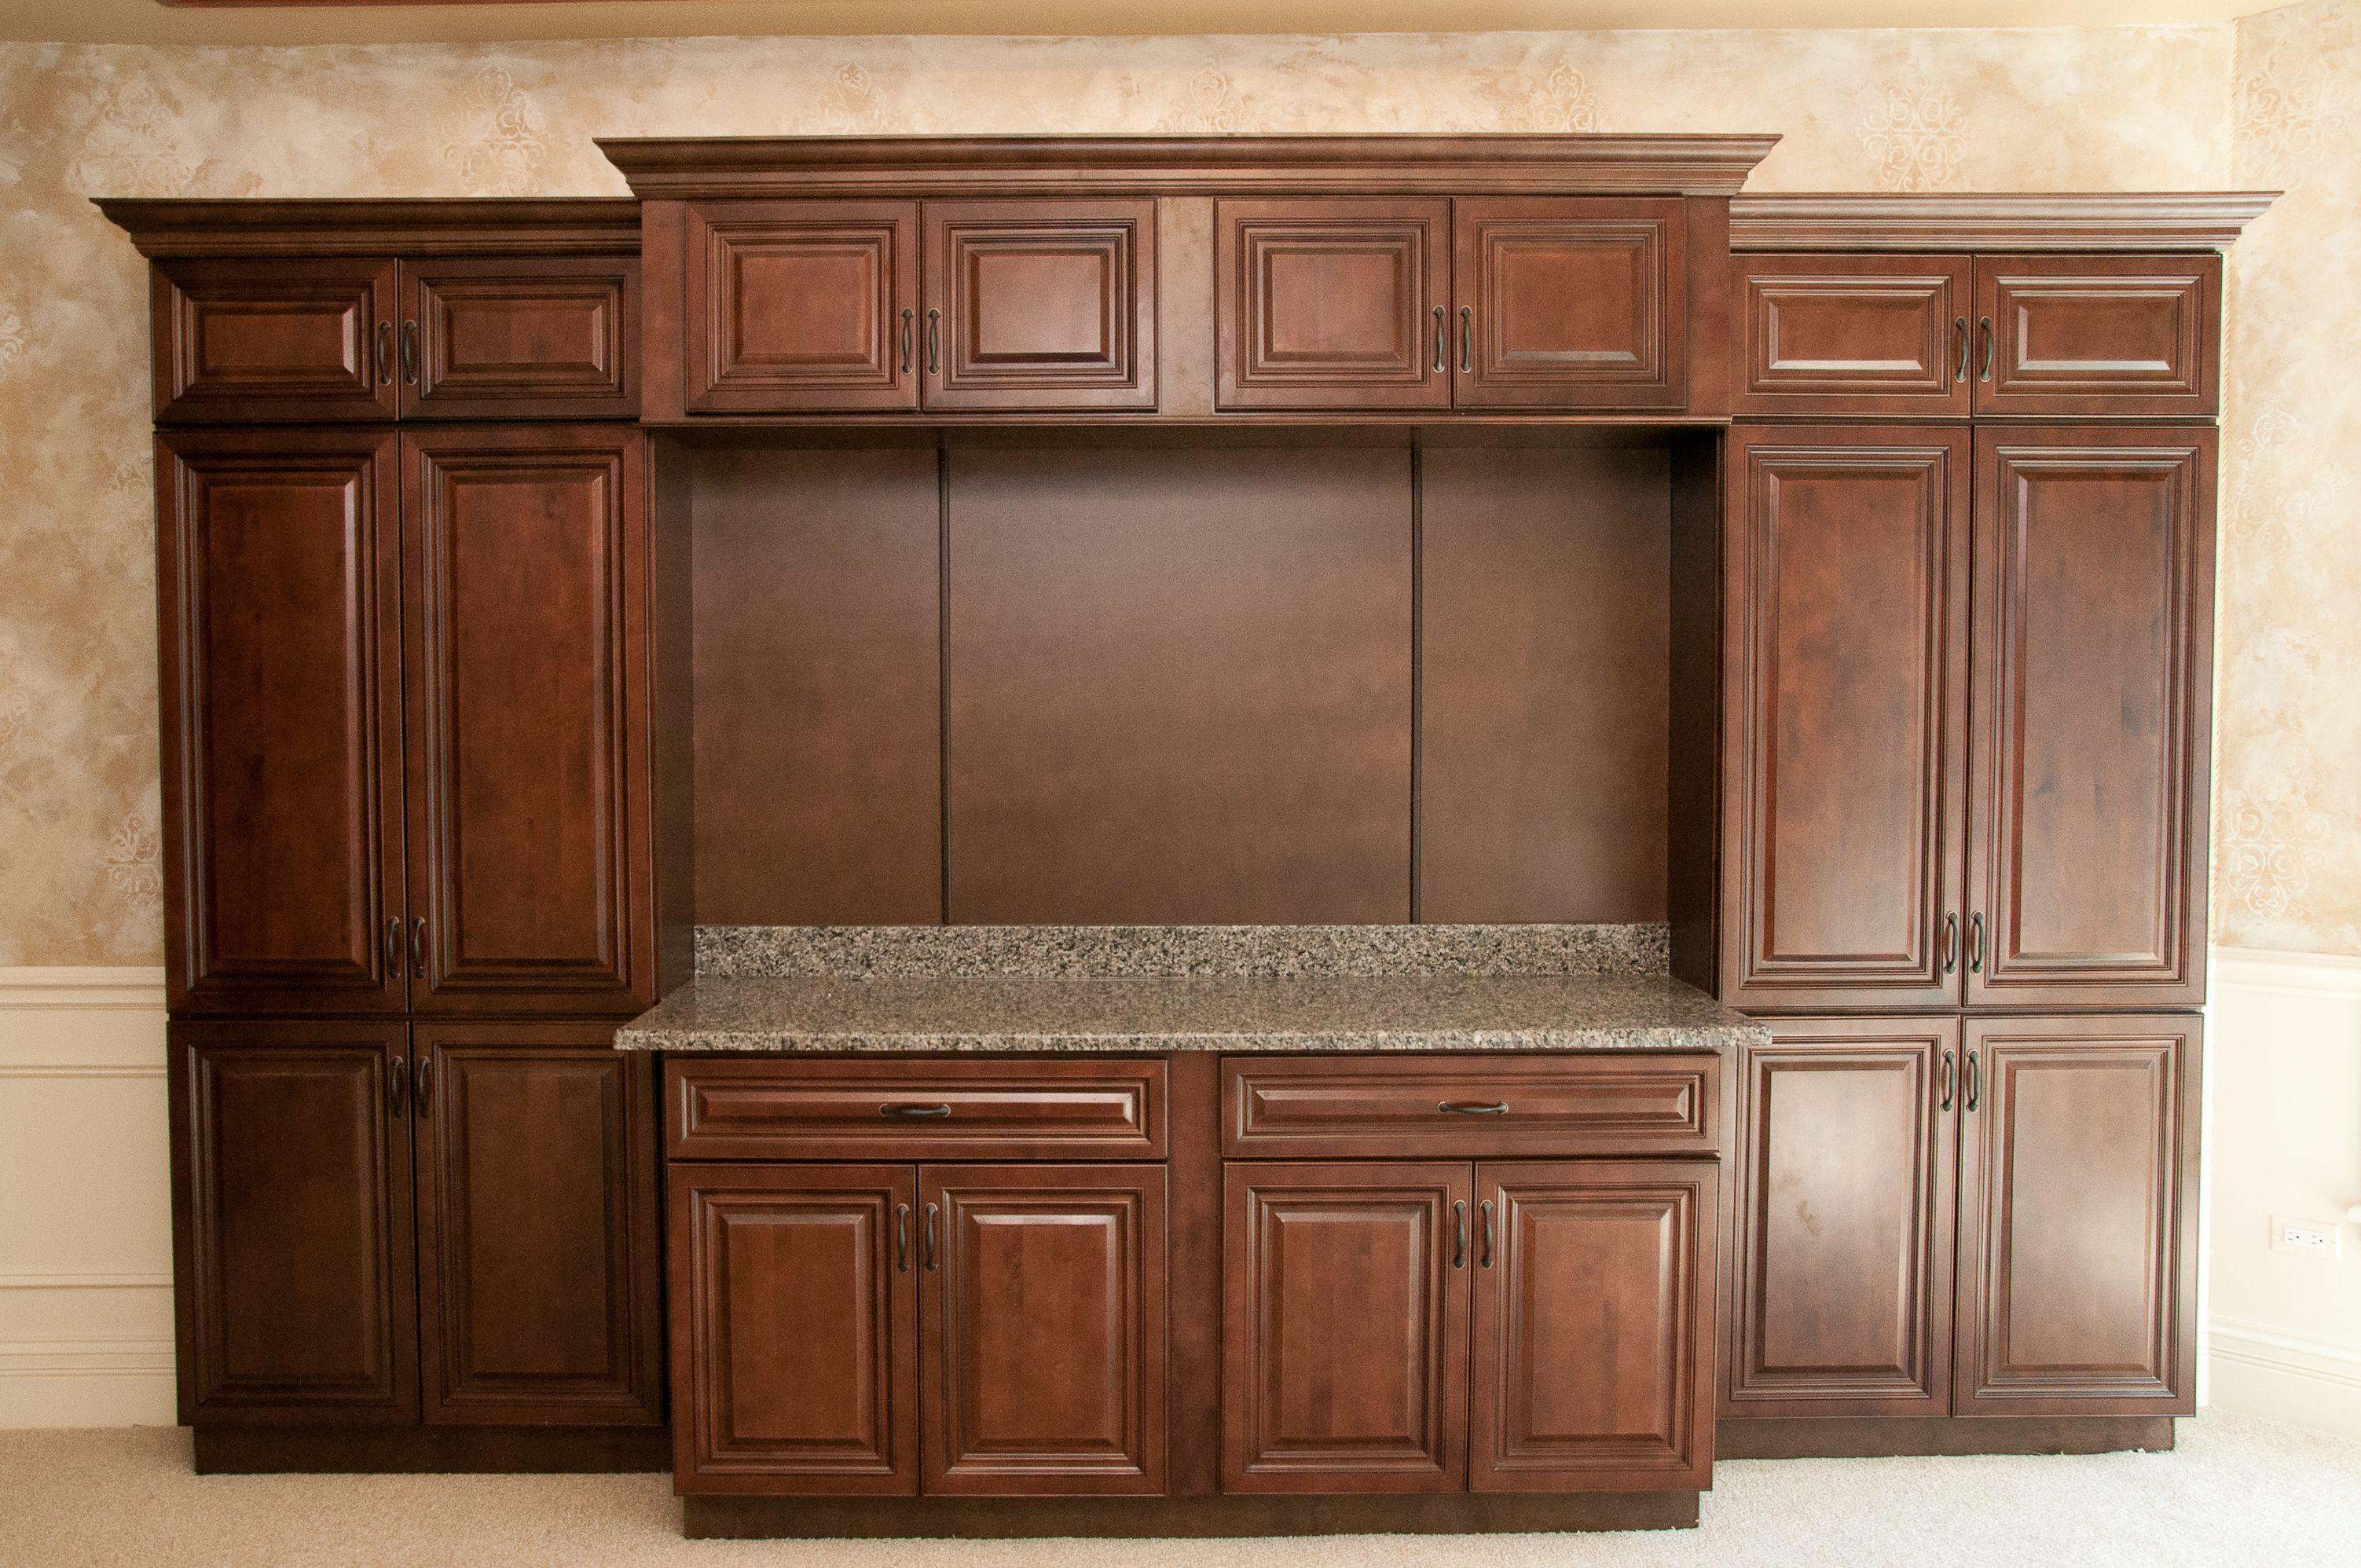 Best Choice Cabinet Premier Series Kensington Door Style 640 x 480